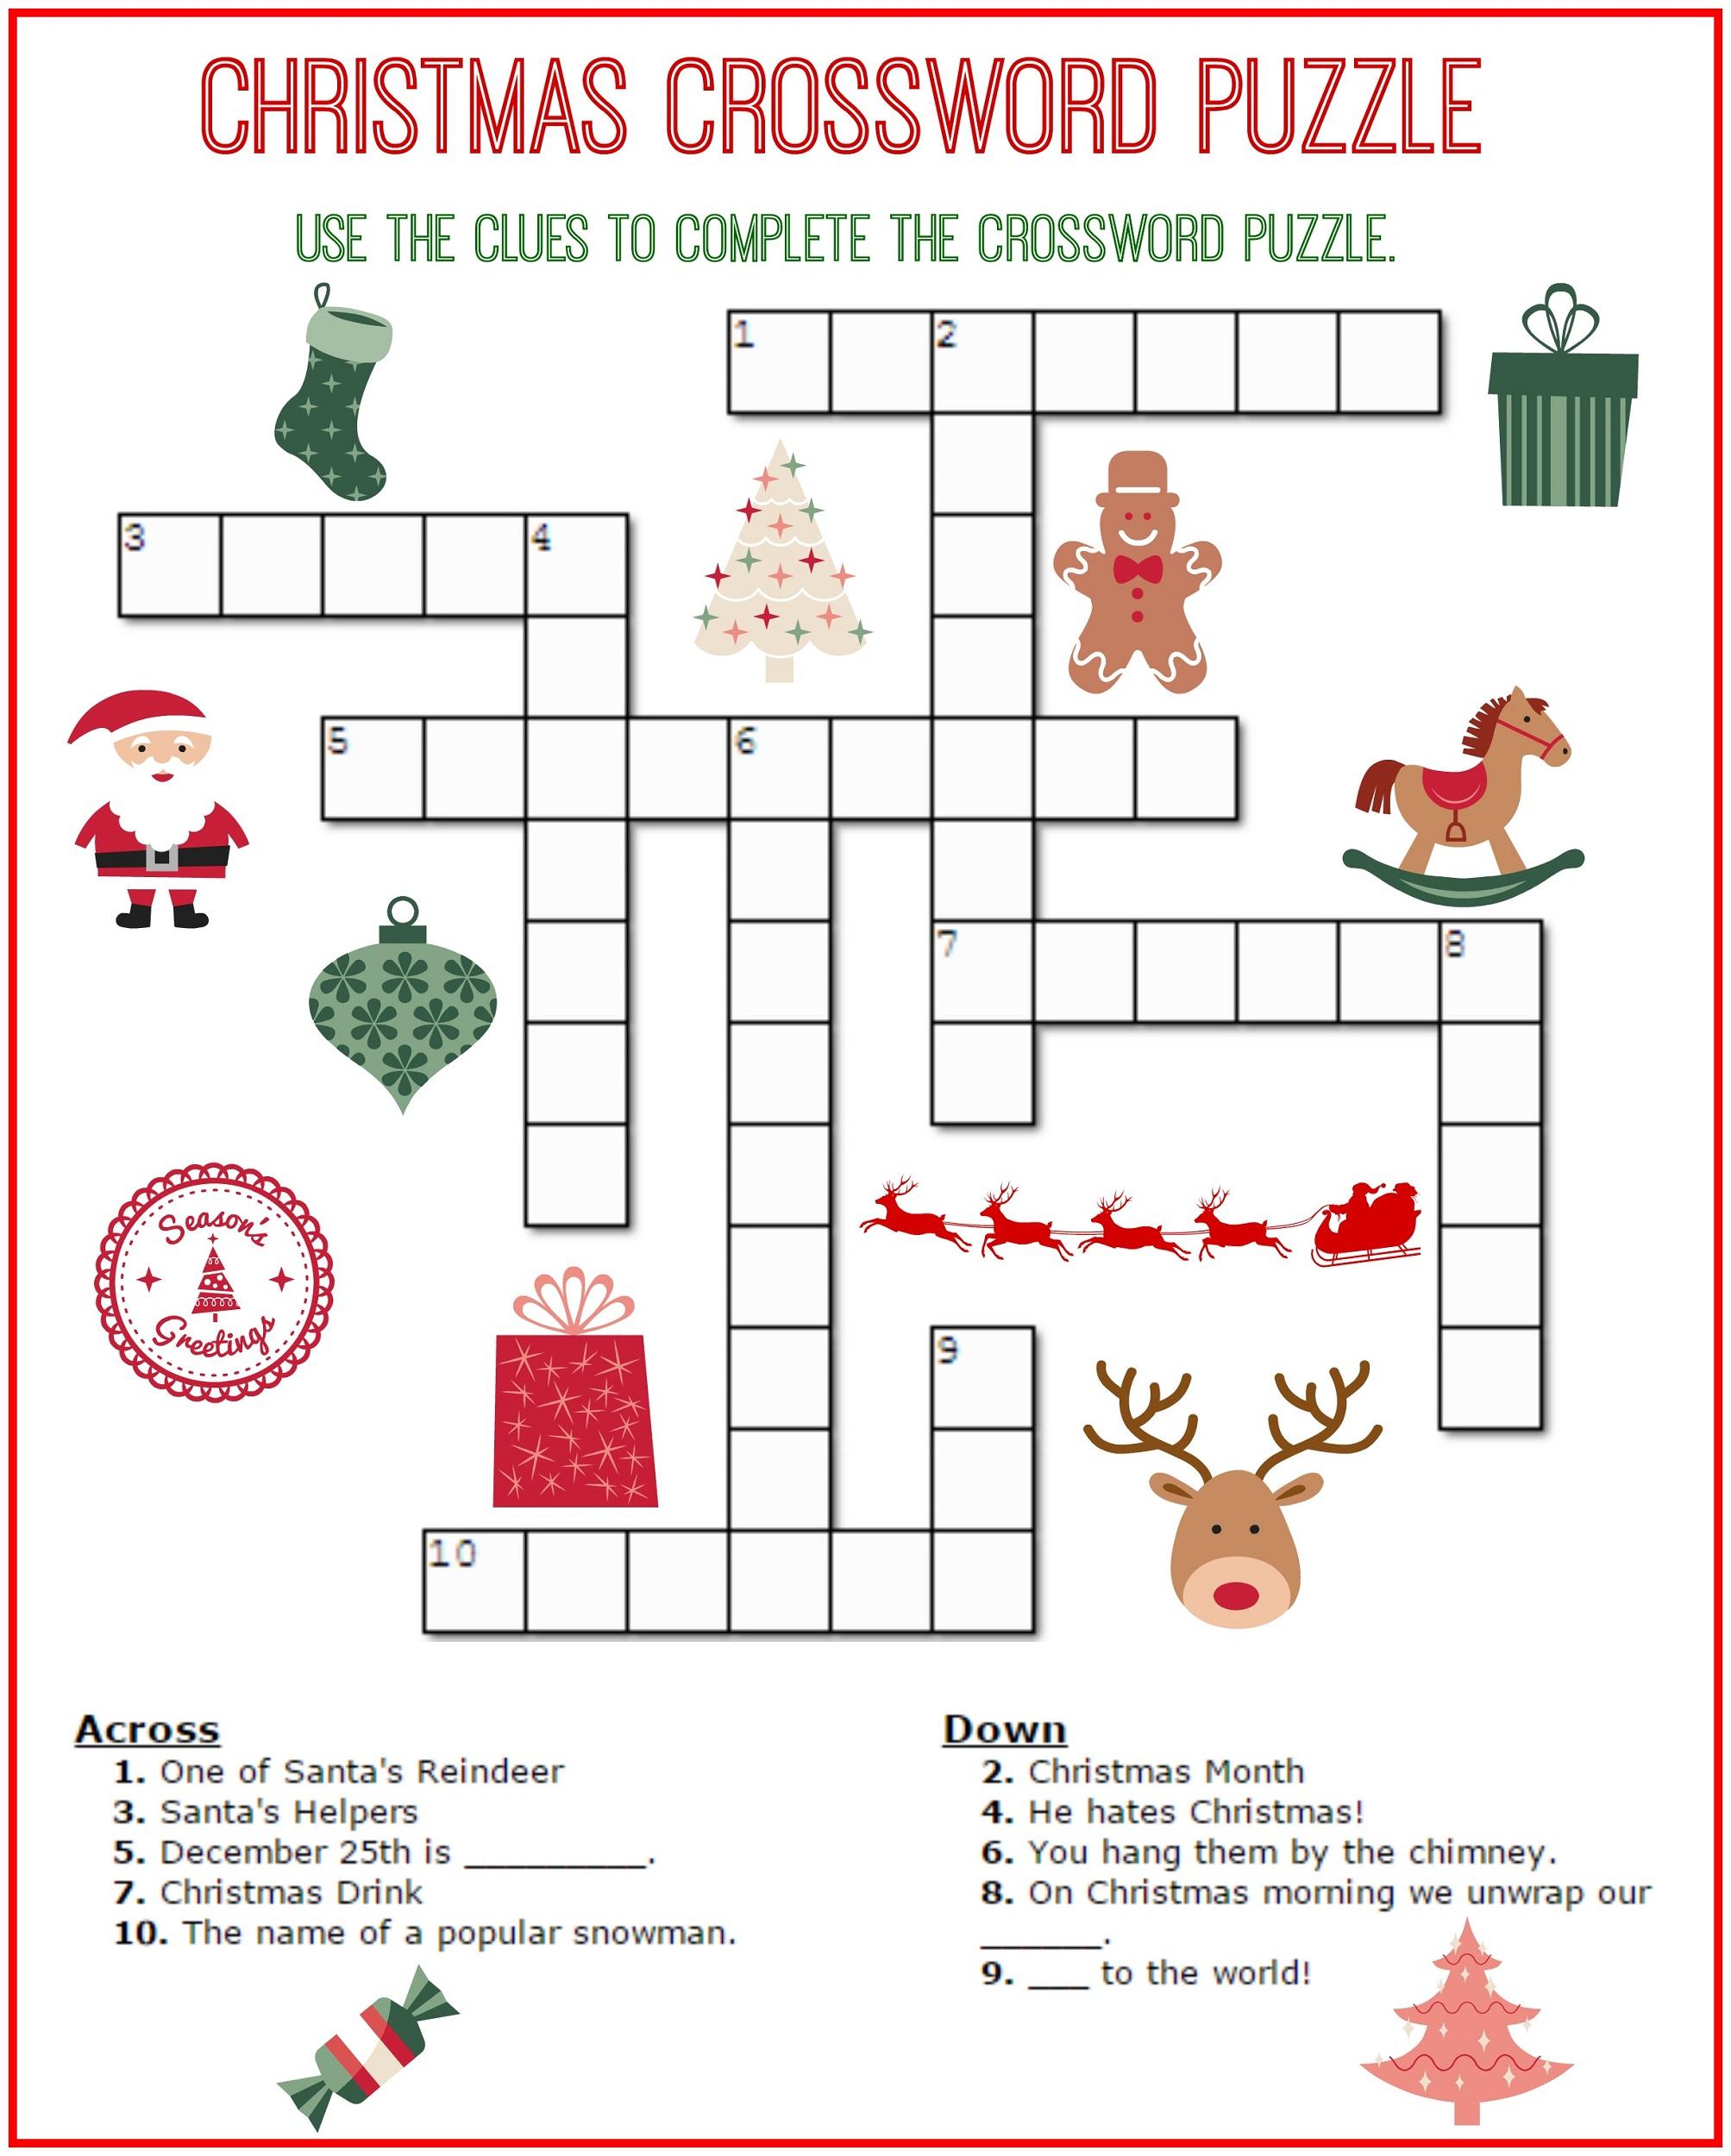 Crossword Puzzle Kids Printable 2017 | Kiddo Shelter - Printable Elementary Crossword Puzzles